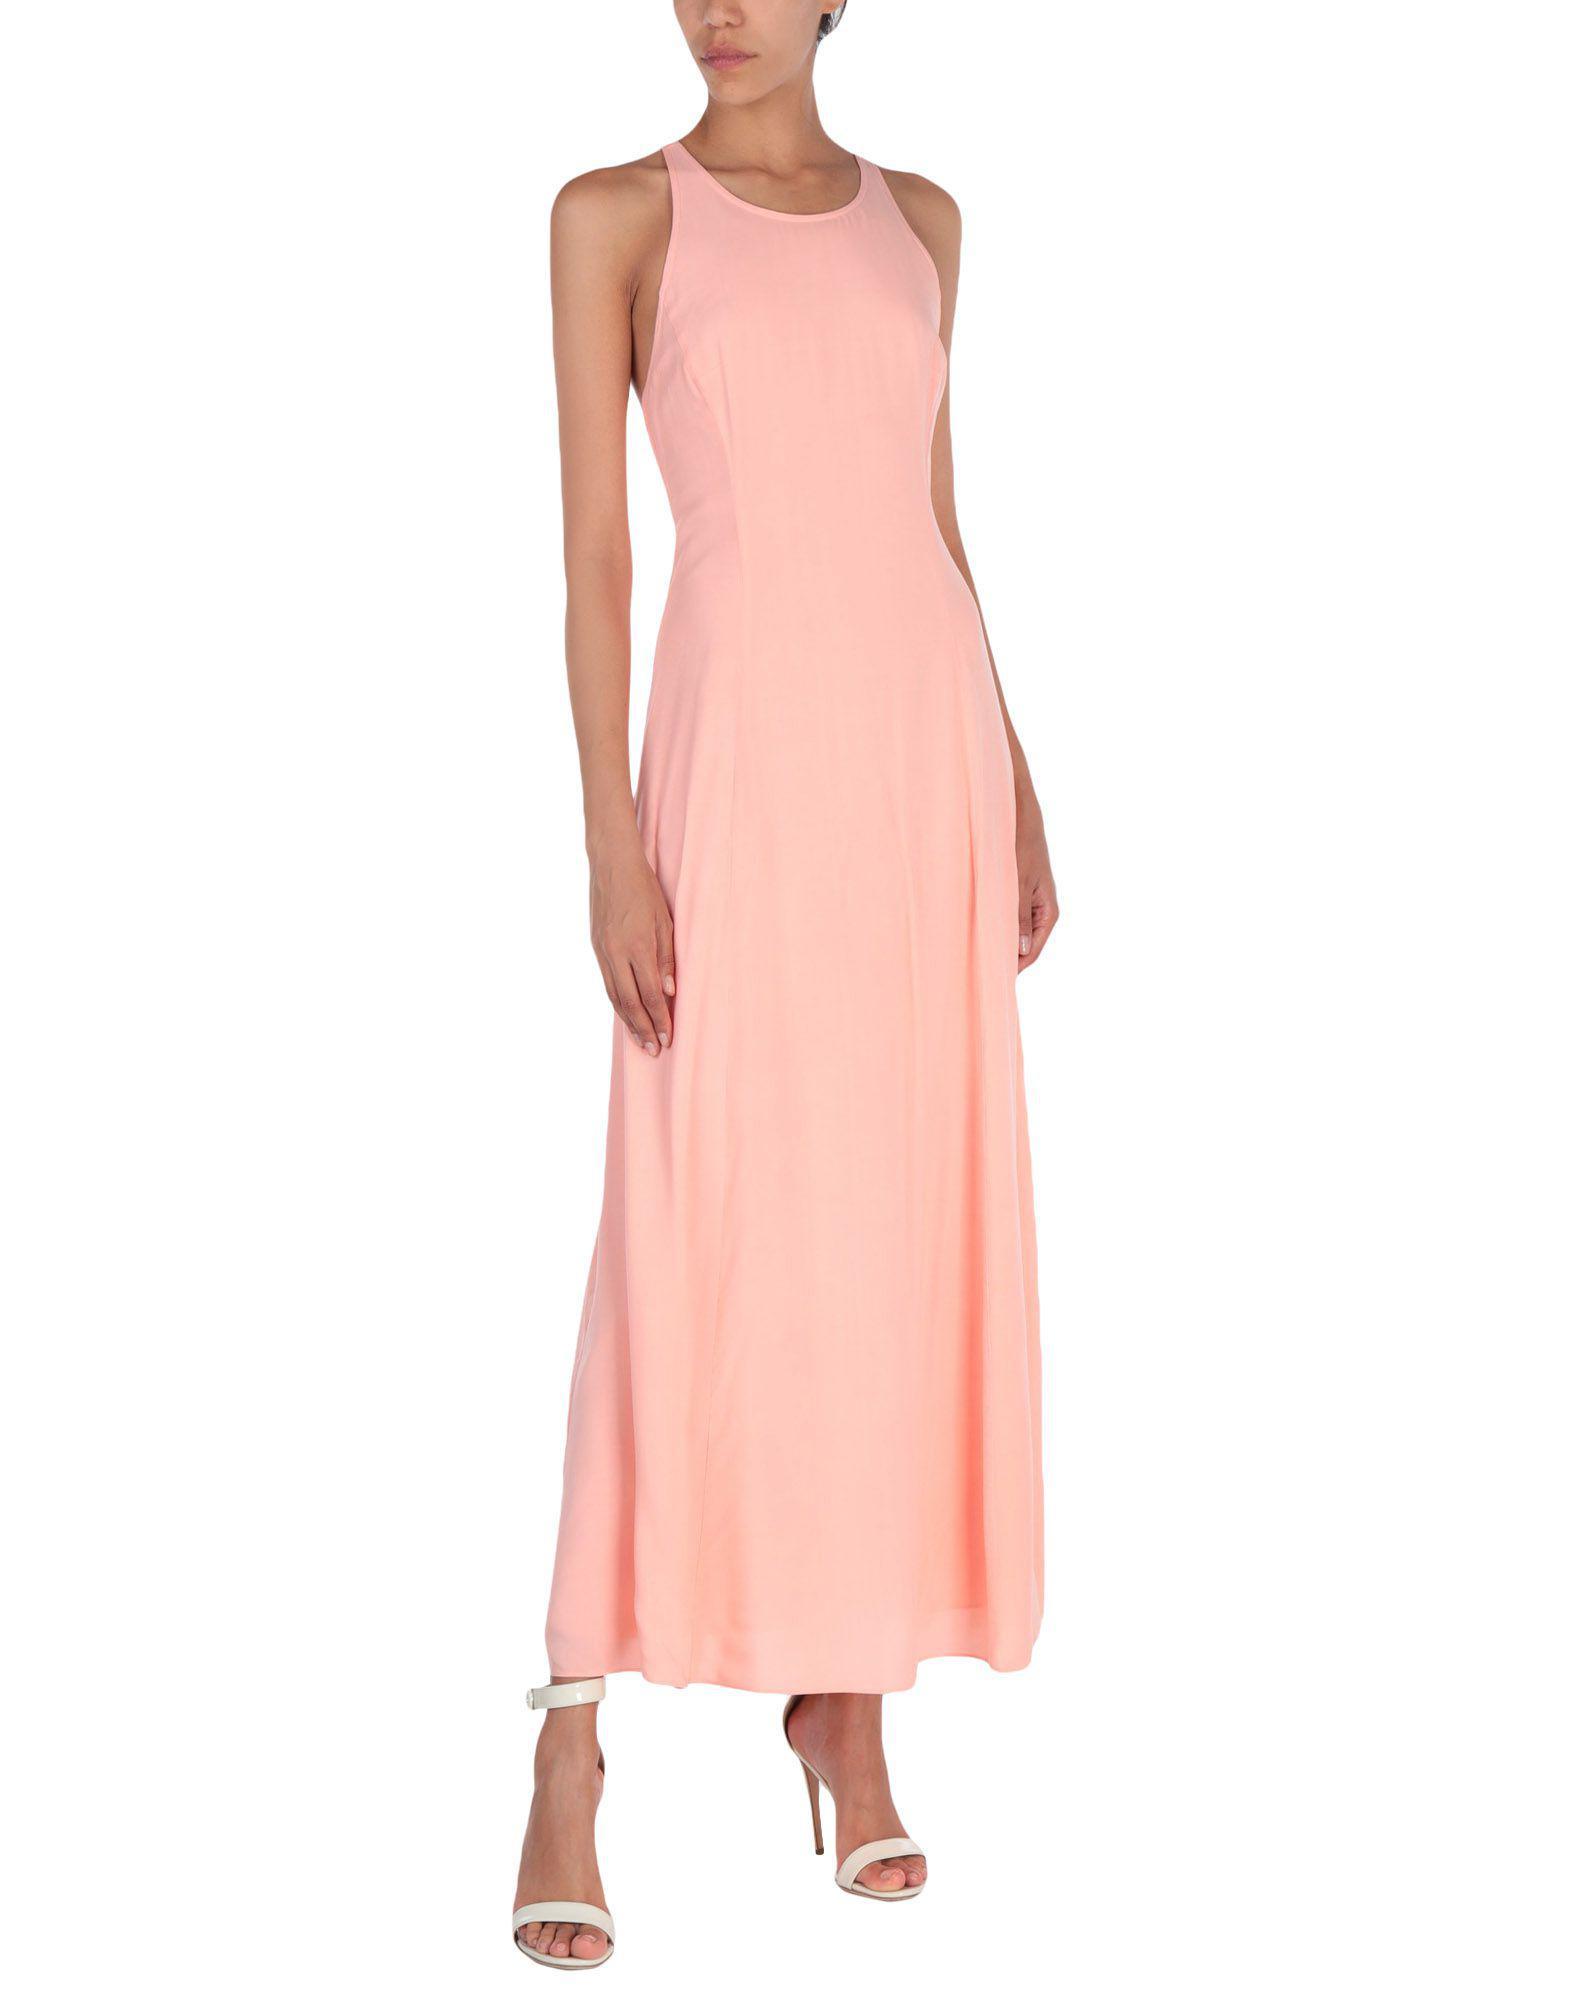 19d416a992fc0c Armani Jeans Long Dress – DACC